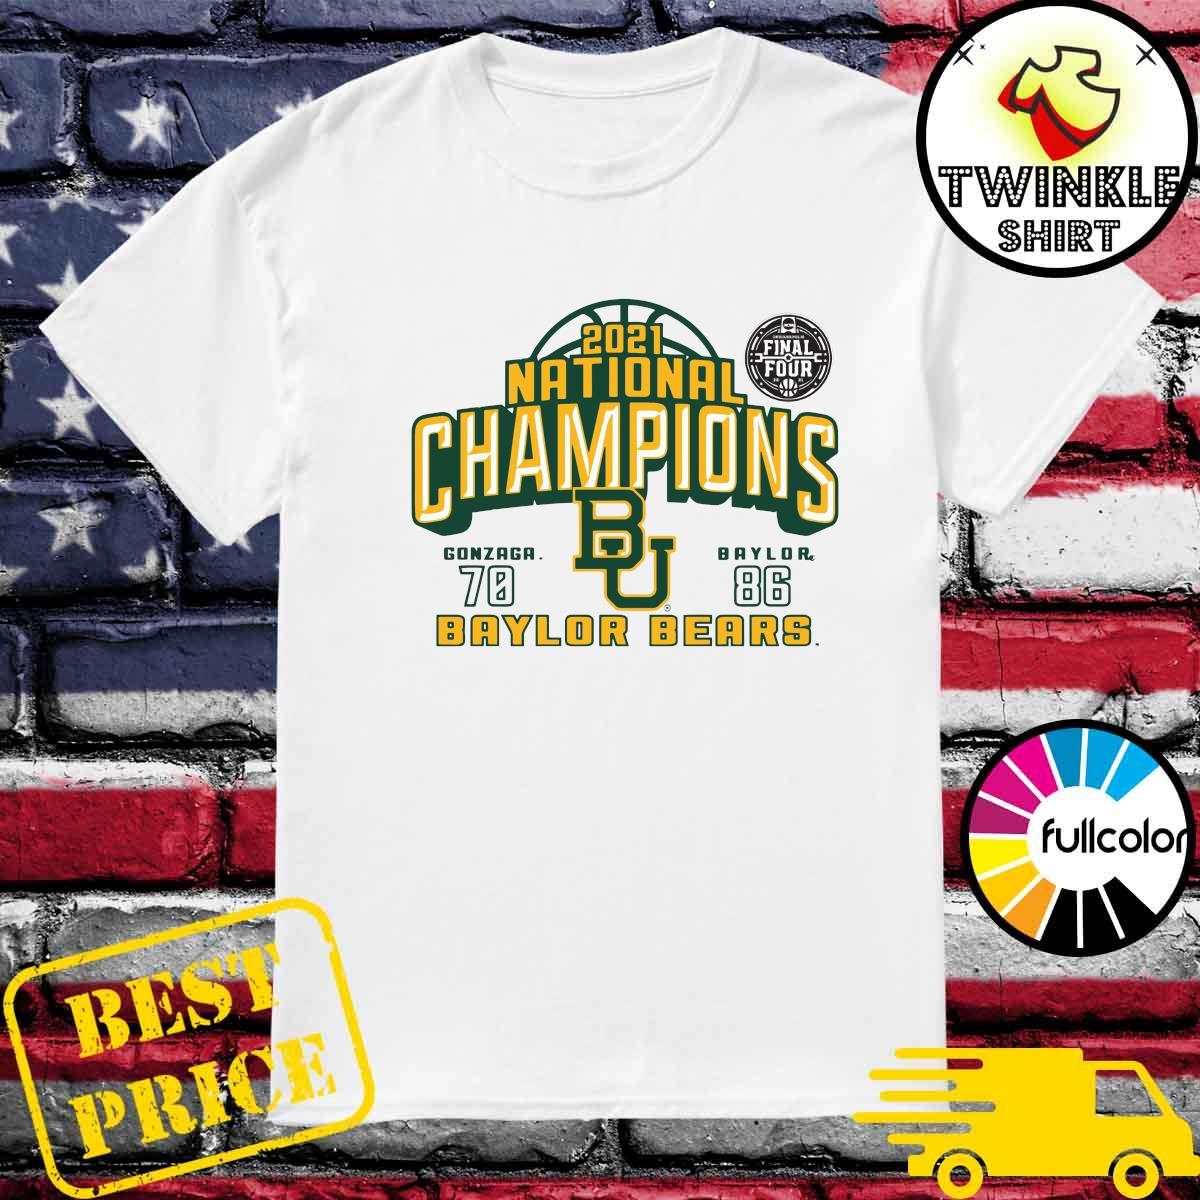 Baylor Bears 2021 NCAA Men's Basketball National Champions With Gonzaga 70 Vs Baylor 86 T-shirt